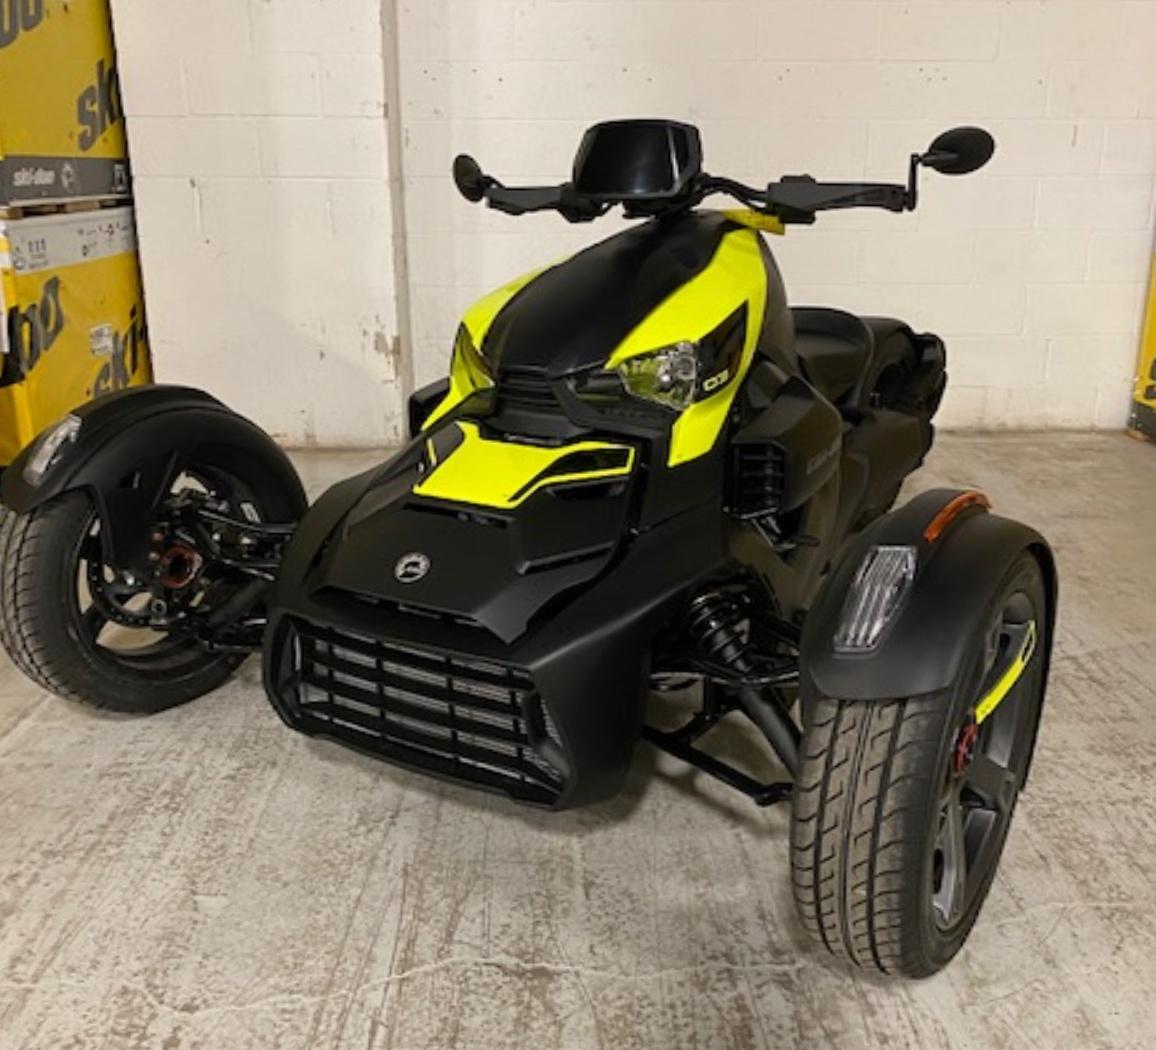 2019 Can-Am Ryker 900 ACE - 600 ACE